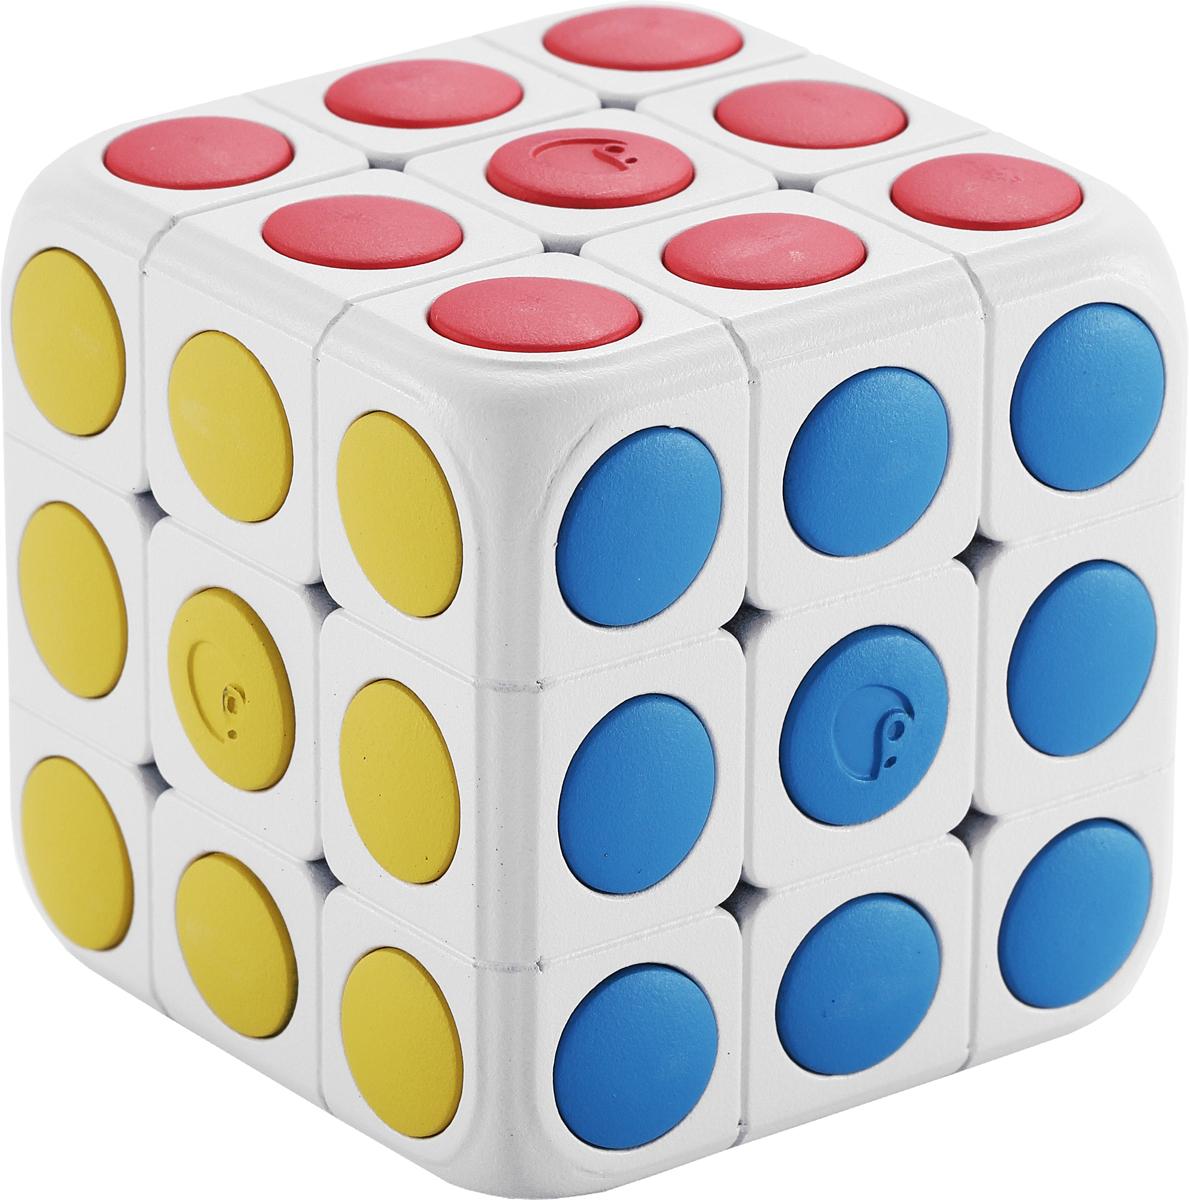 Roobo Головоломка Cube Tastic